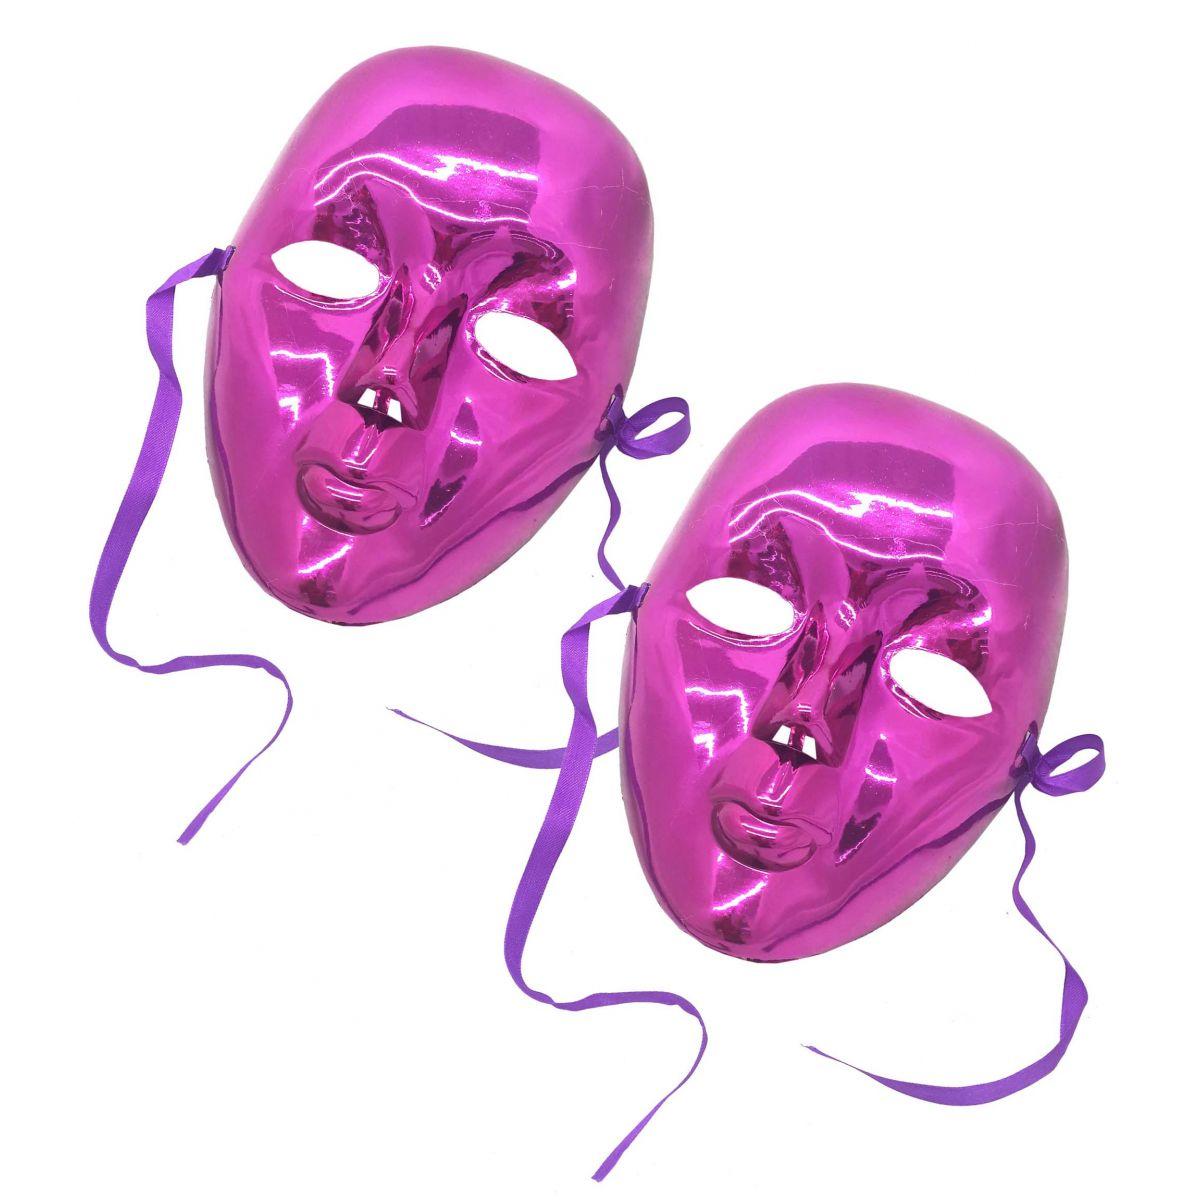 Conjunto 2 Mascaras Para Festa Baile Carnaval Halloween Fantasia Metalizada  Rosa (BL-0258- 4974d10f05b